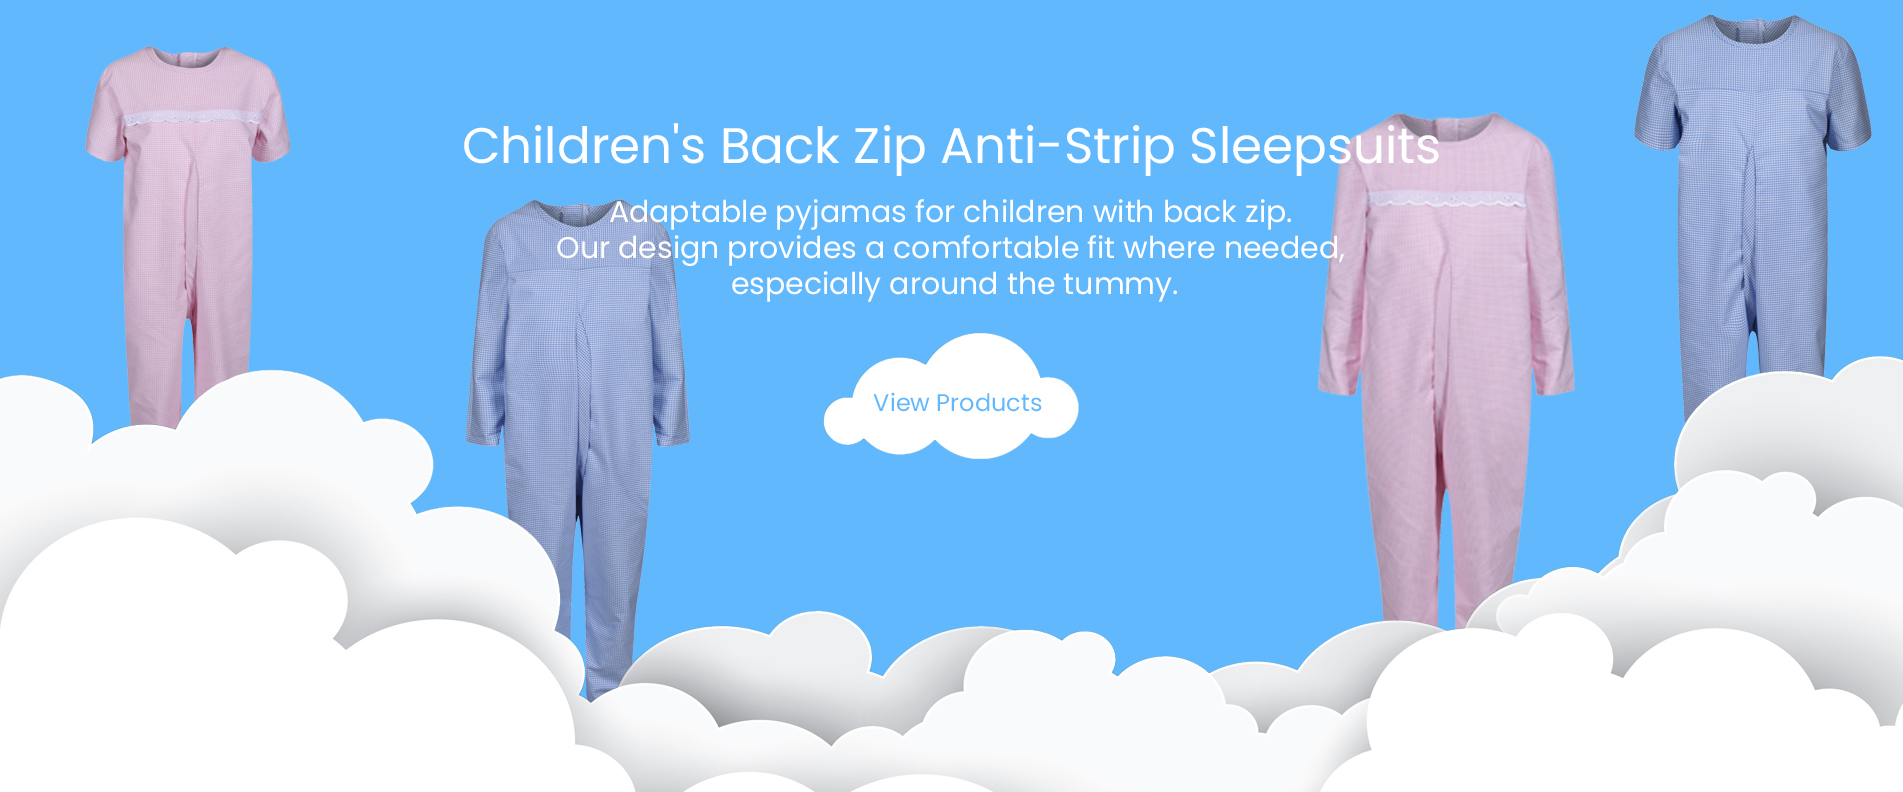 Children's Back Zip Anti-Strip Sleepsuits